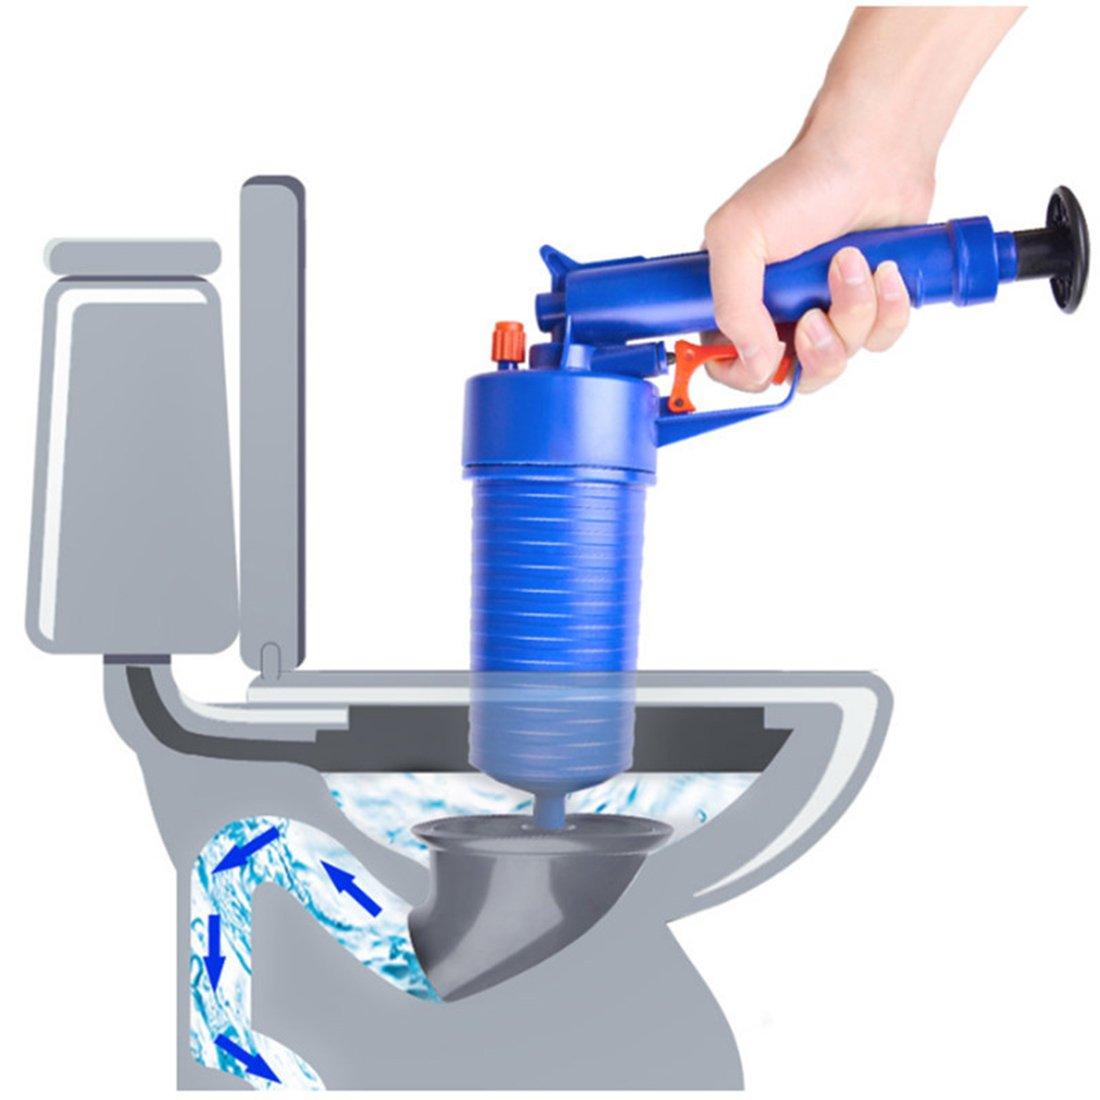 AlenX Air Power Drain Blaster gun, High Pressure Powerful Manual sink Plunger Opener cleaner pump for Bath Toilets, Bathroom, Shower, kitchen Clogged Pipe Bathtub